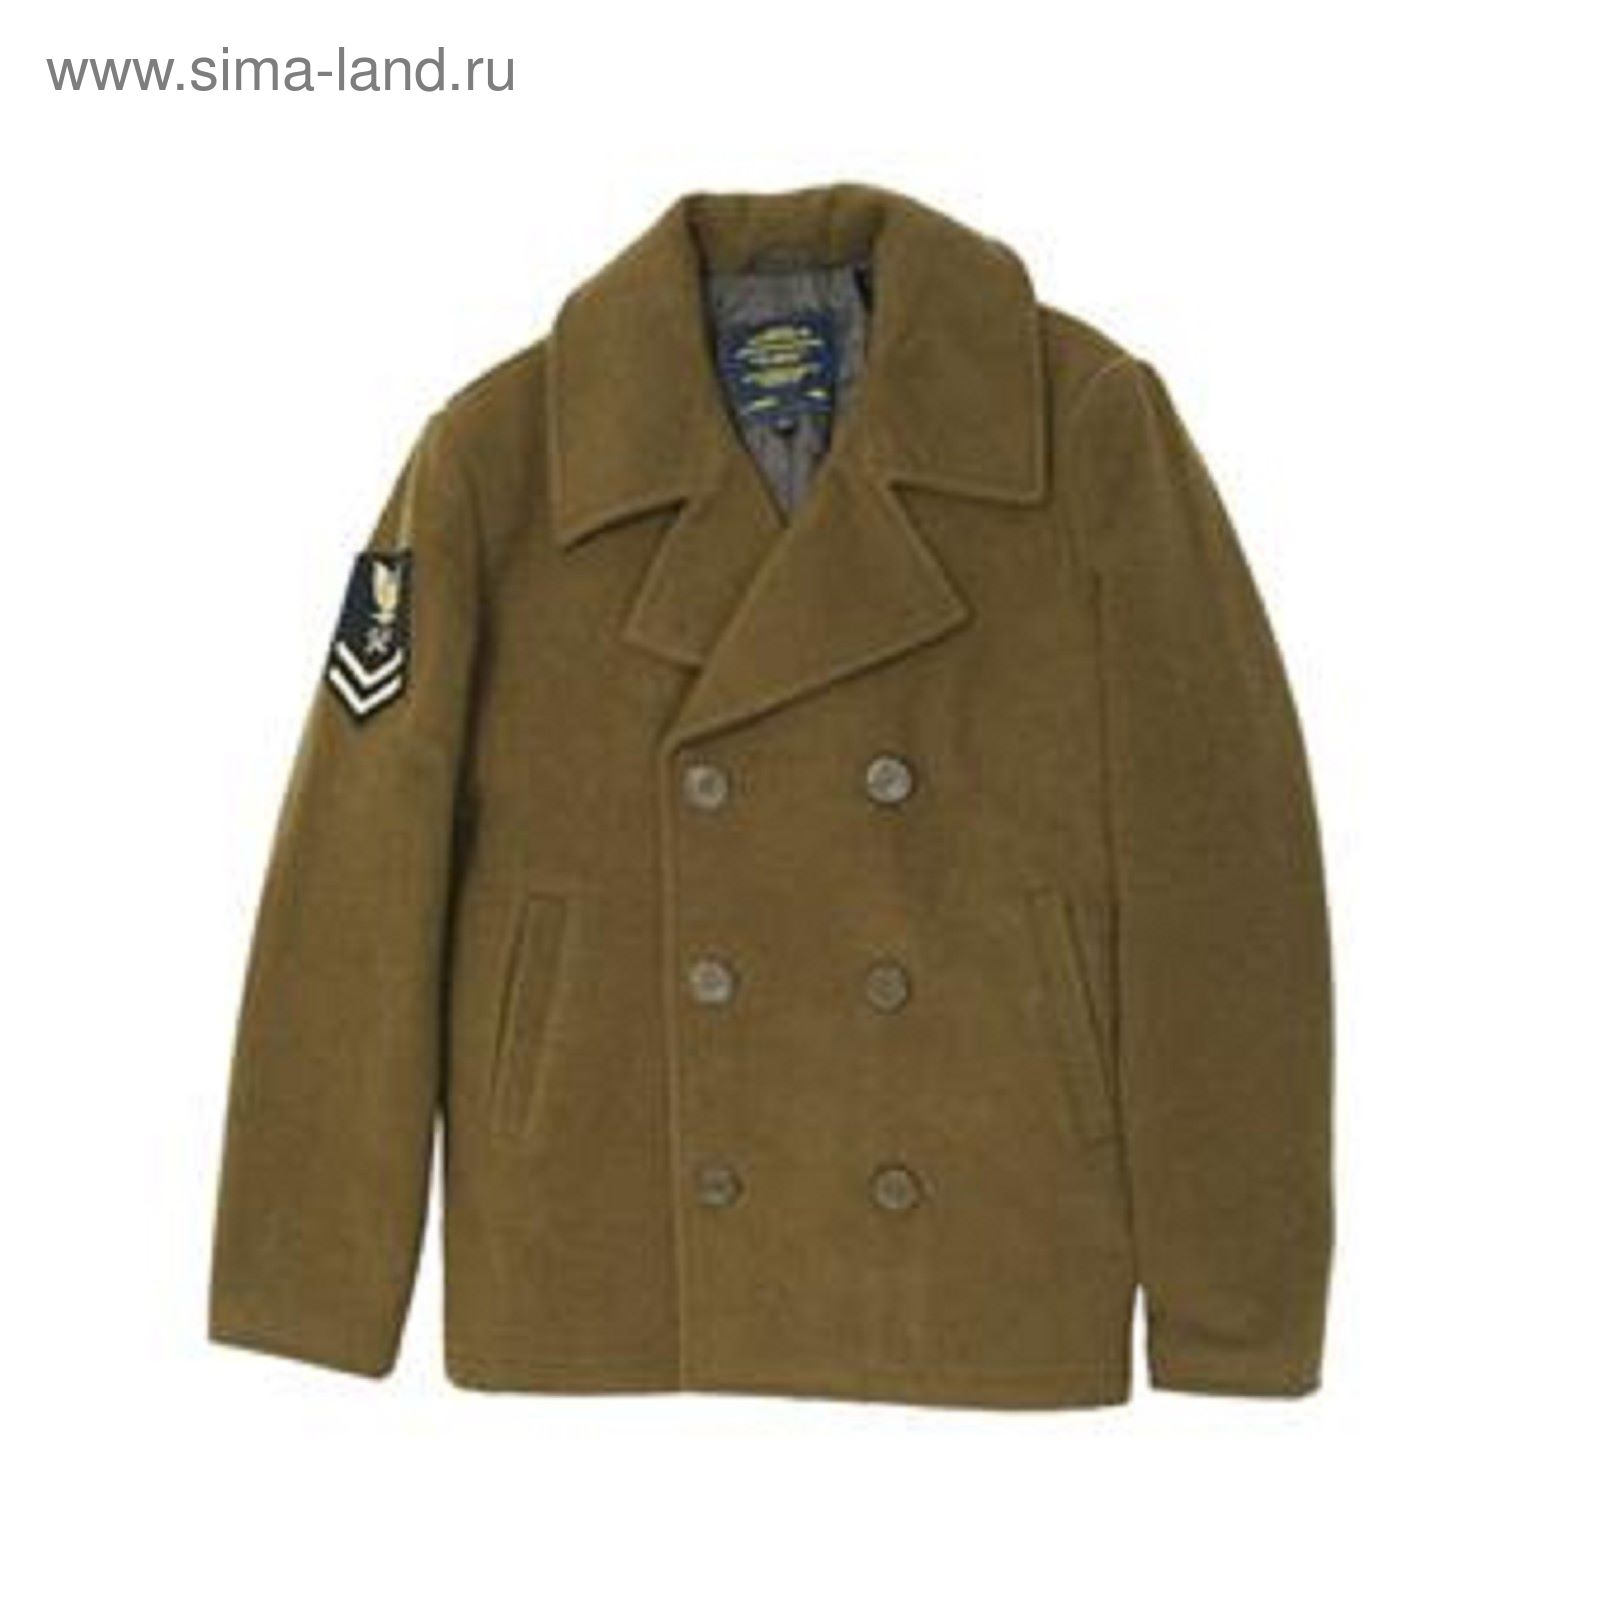 f20639815 Куртка Captain Pea Coat Alpha Industries moss M (1807224) - Купить ...